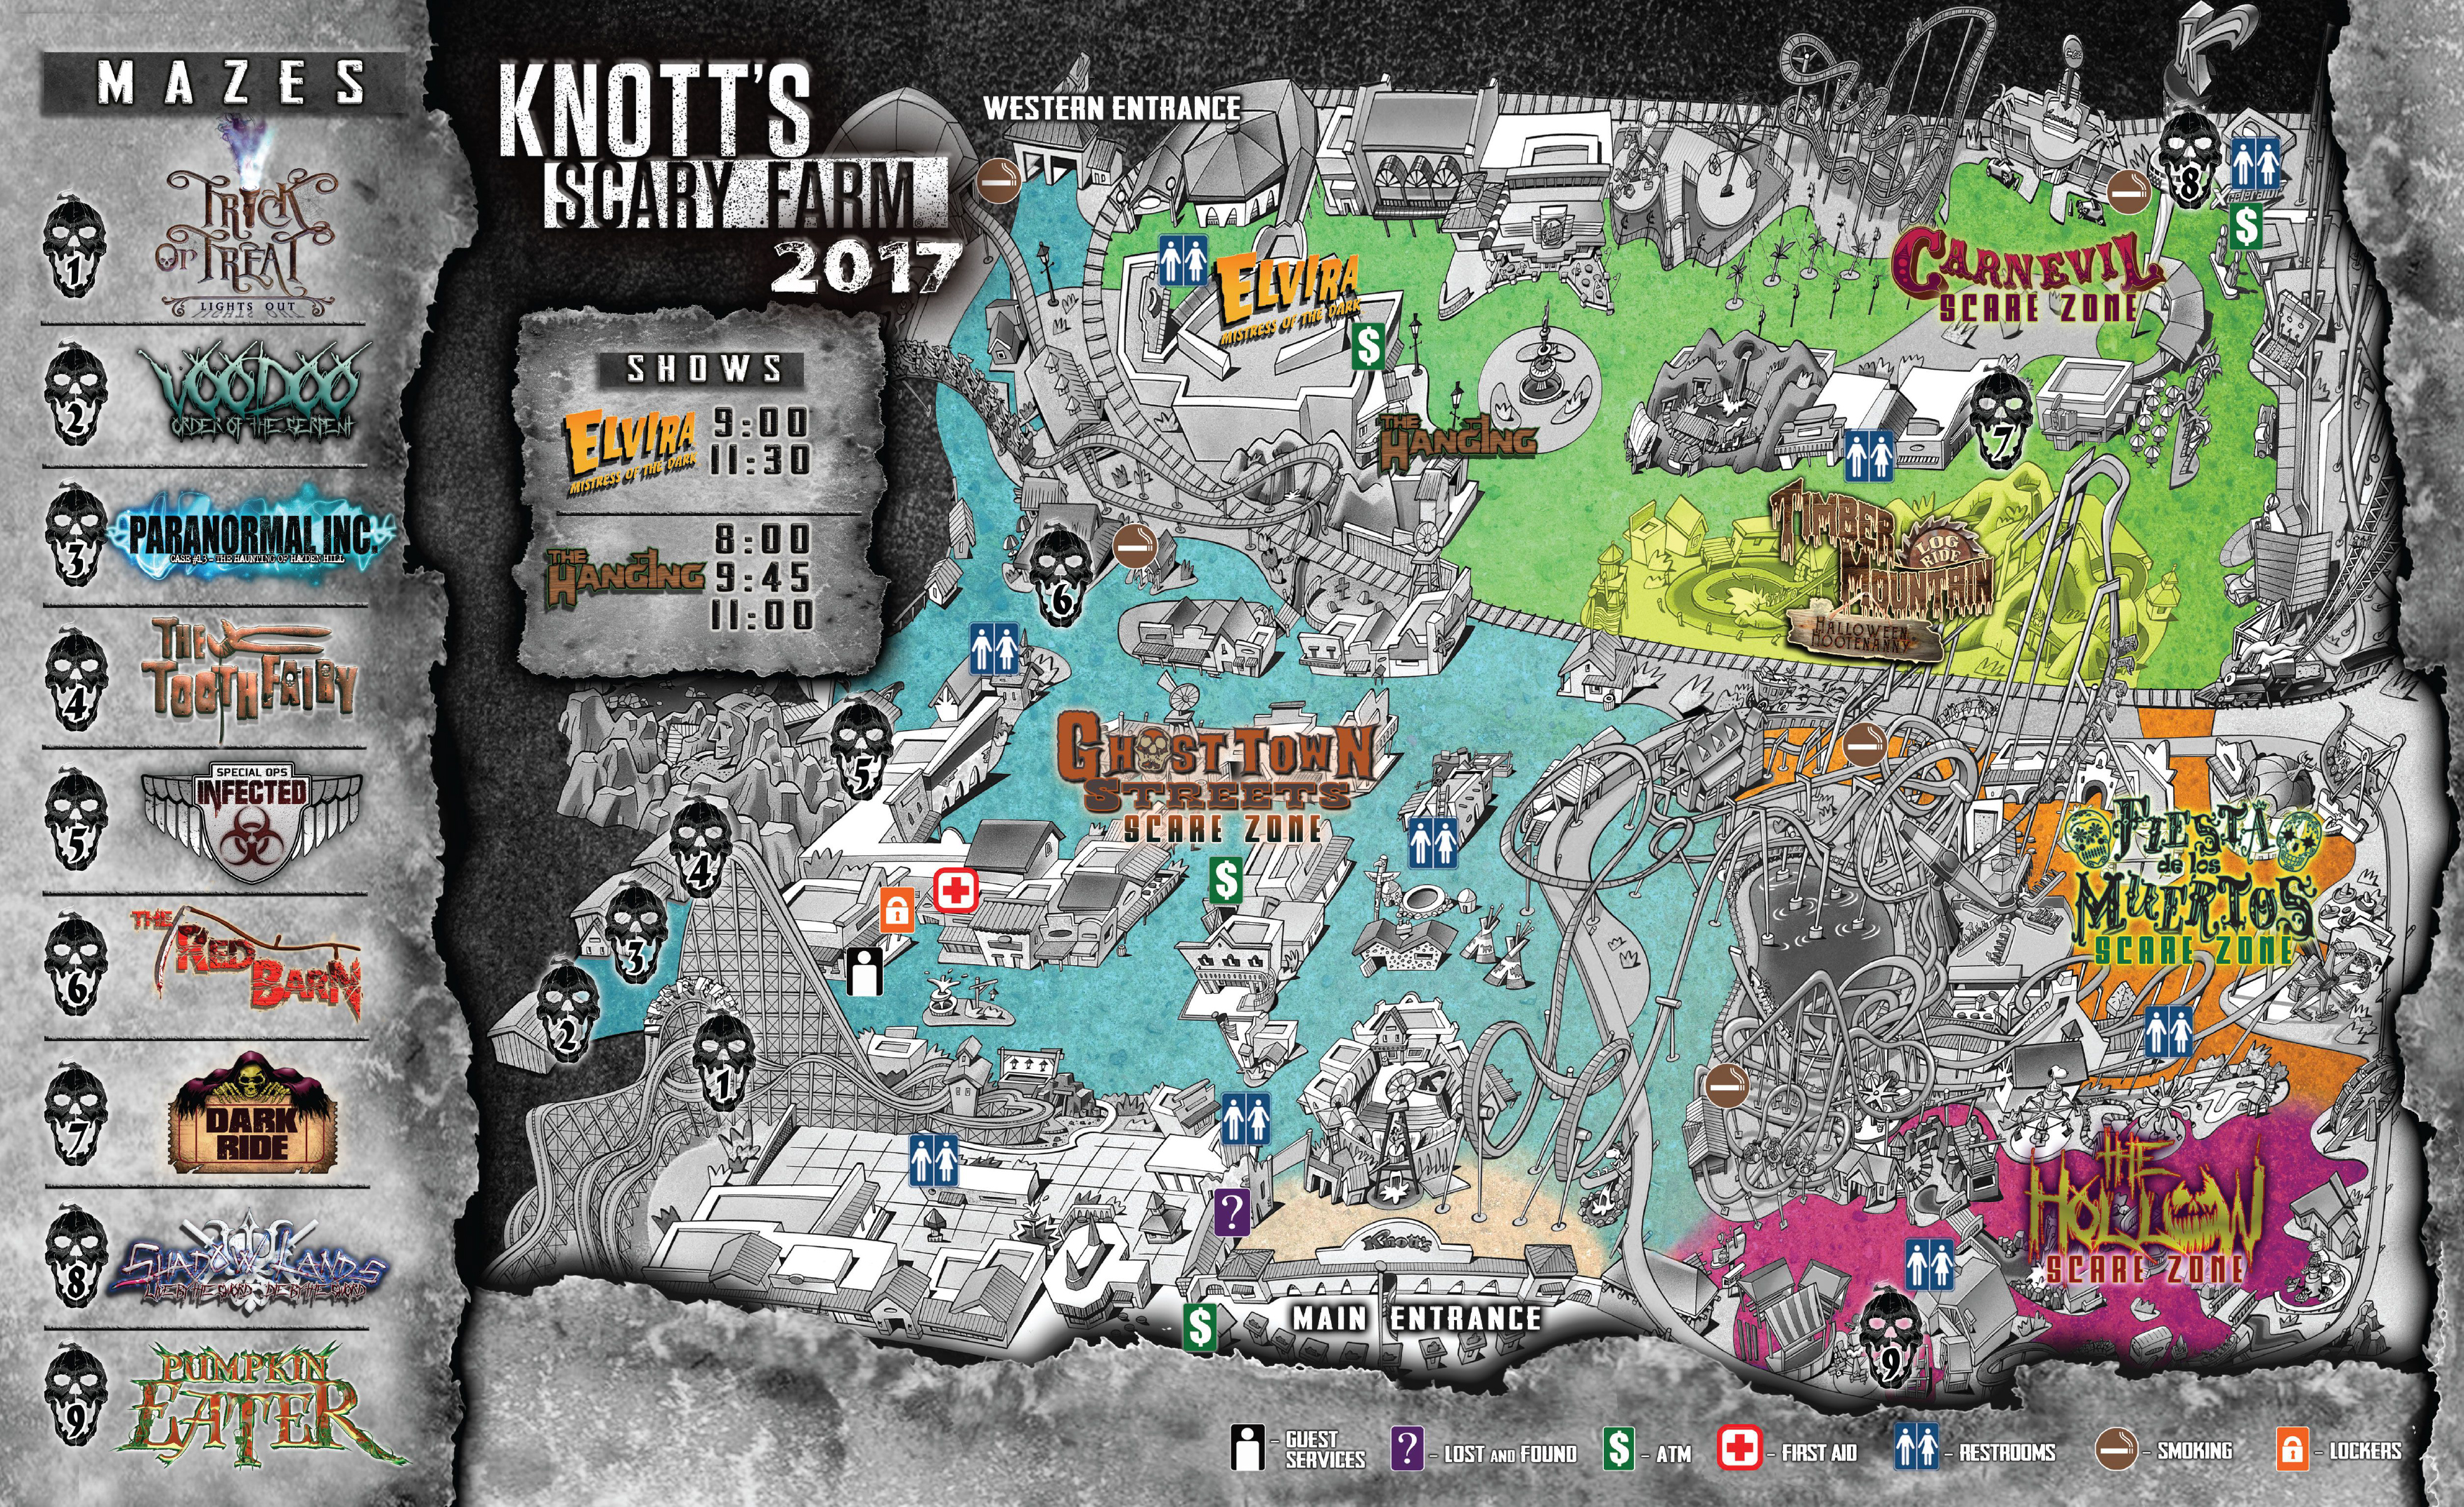 Review: Knott's Berry Farm - Knott's Scary Farm 2017 on